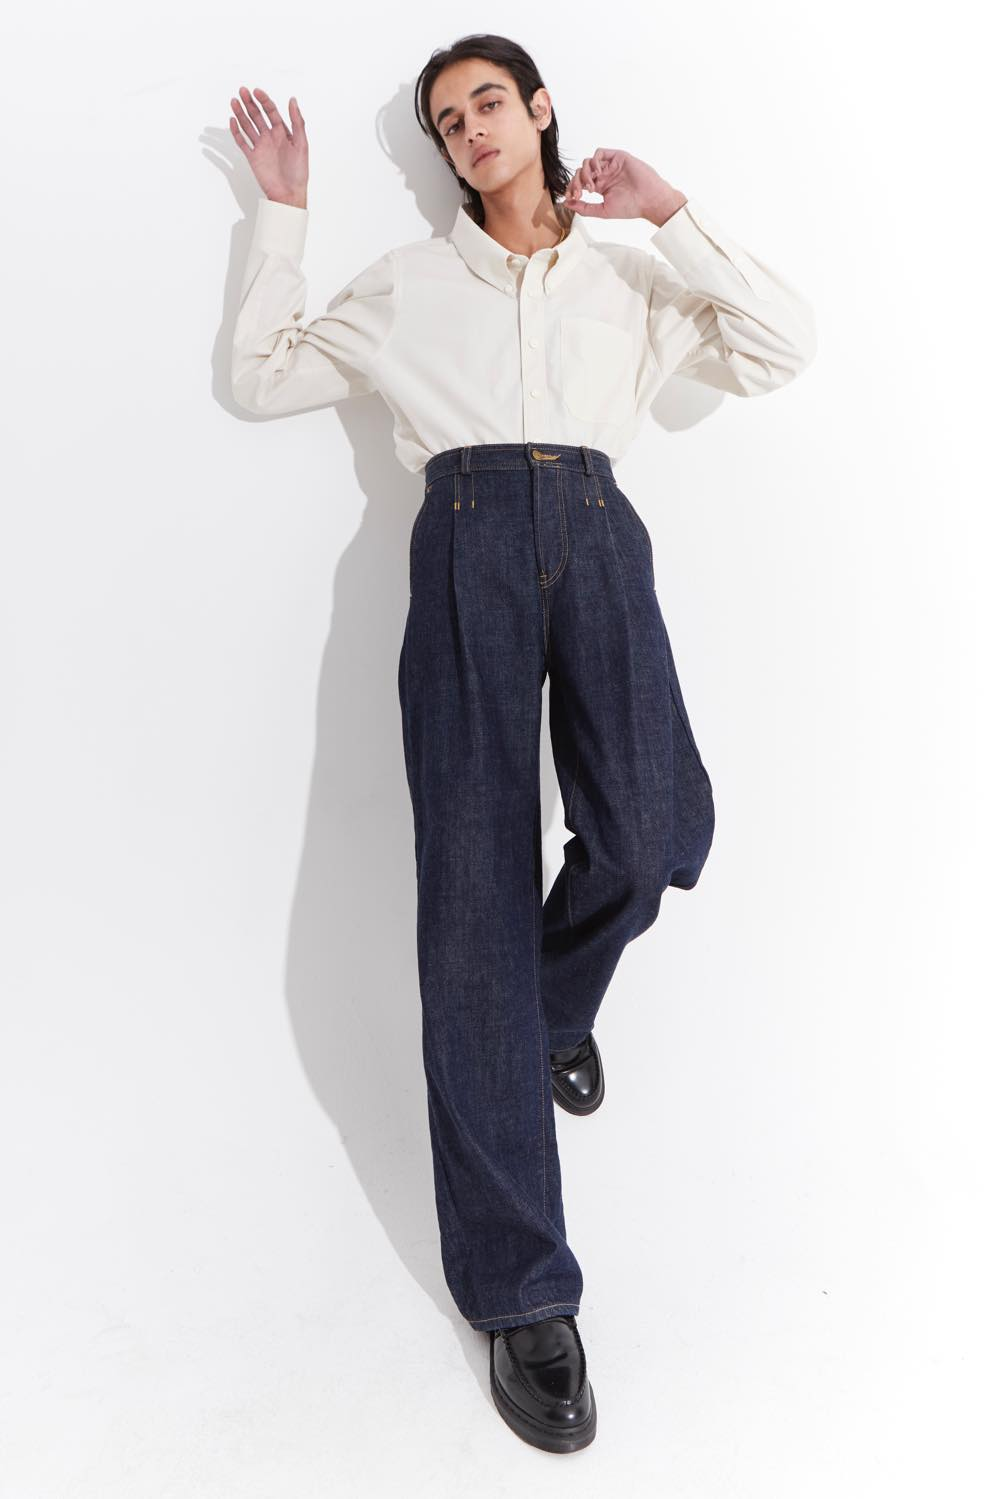 RICE NINE TEN (ライス ナイン テン)2021年秋冬 コレクション